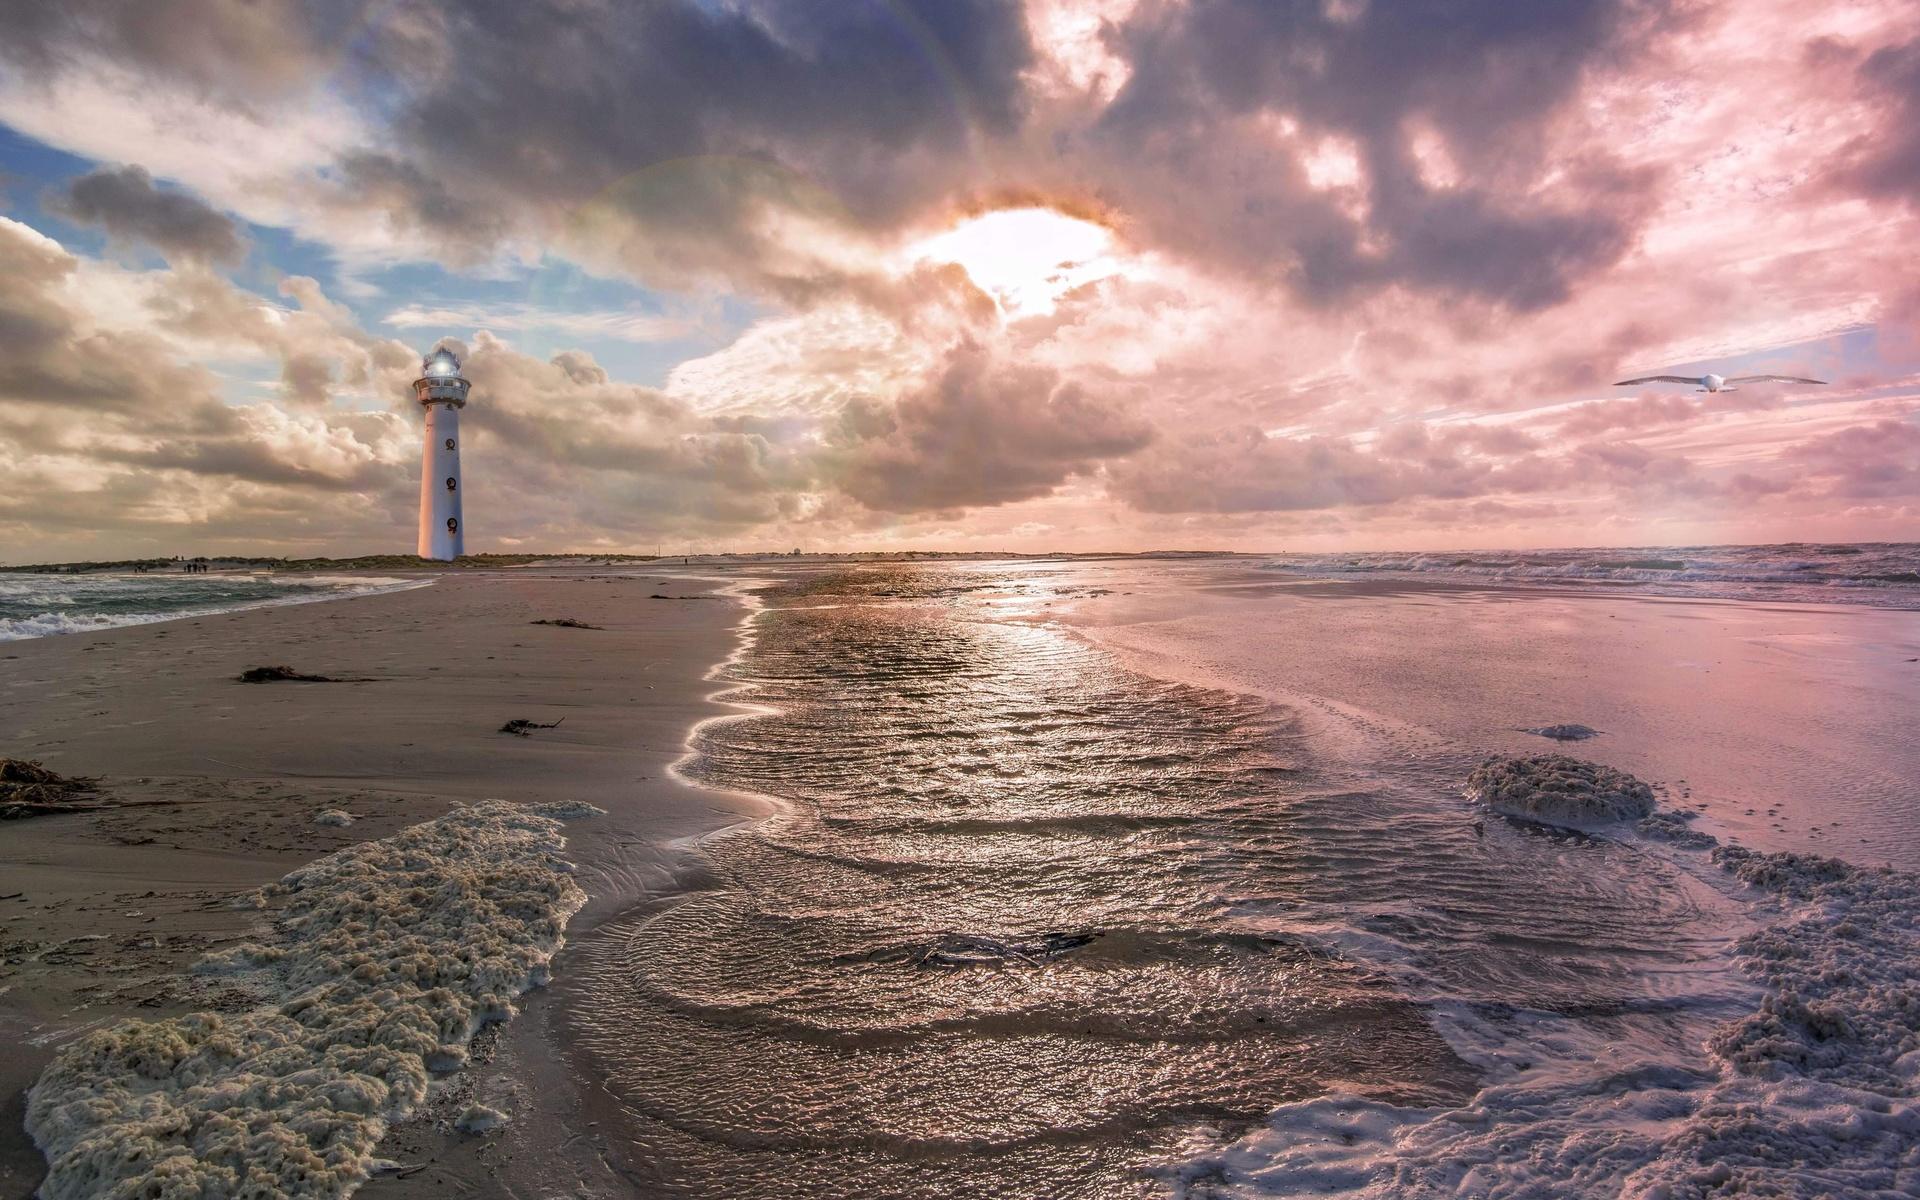 небо, море, волны, маяк